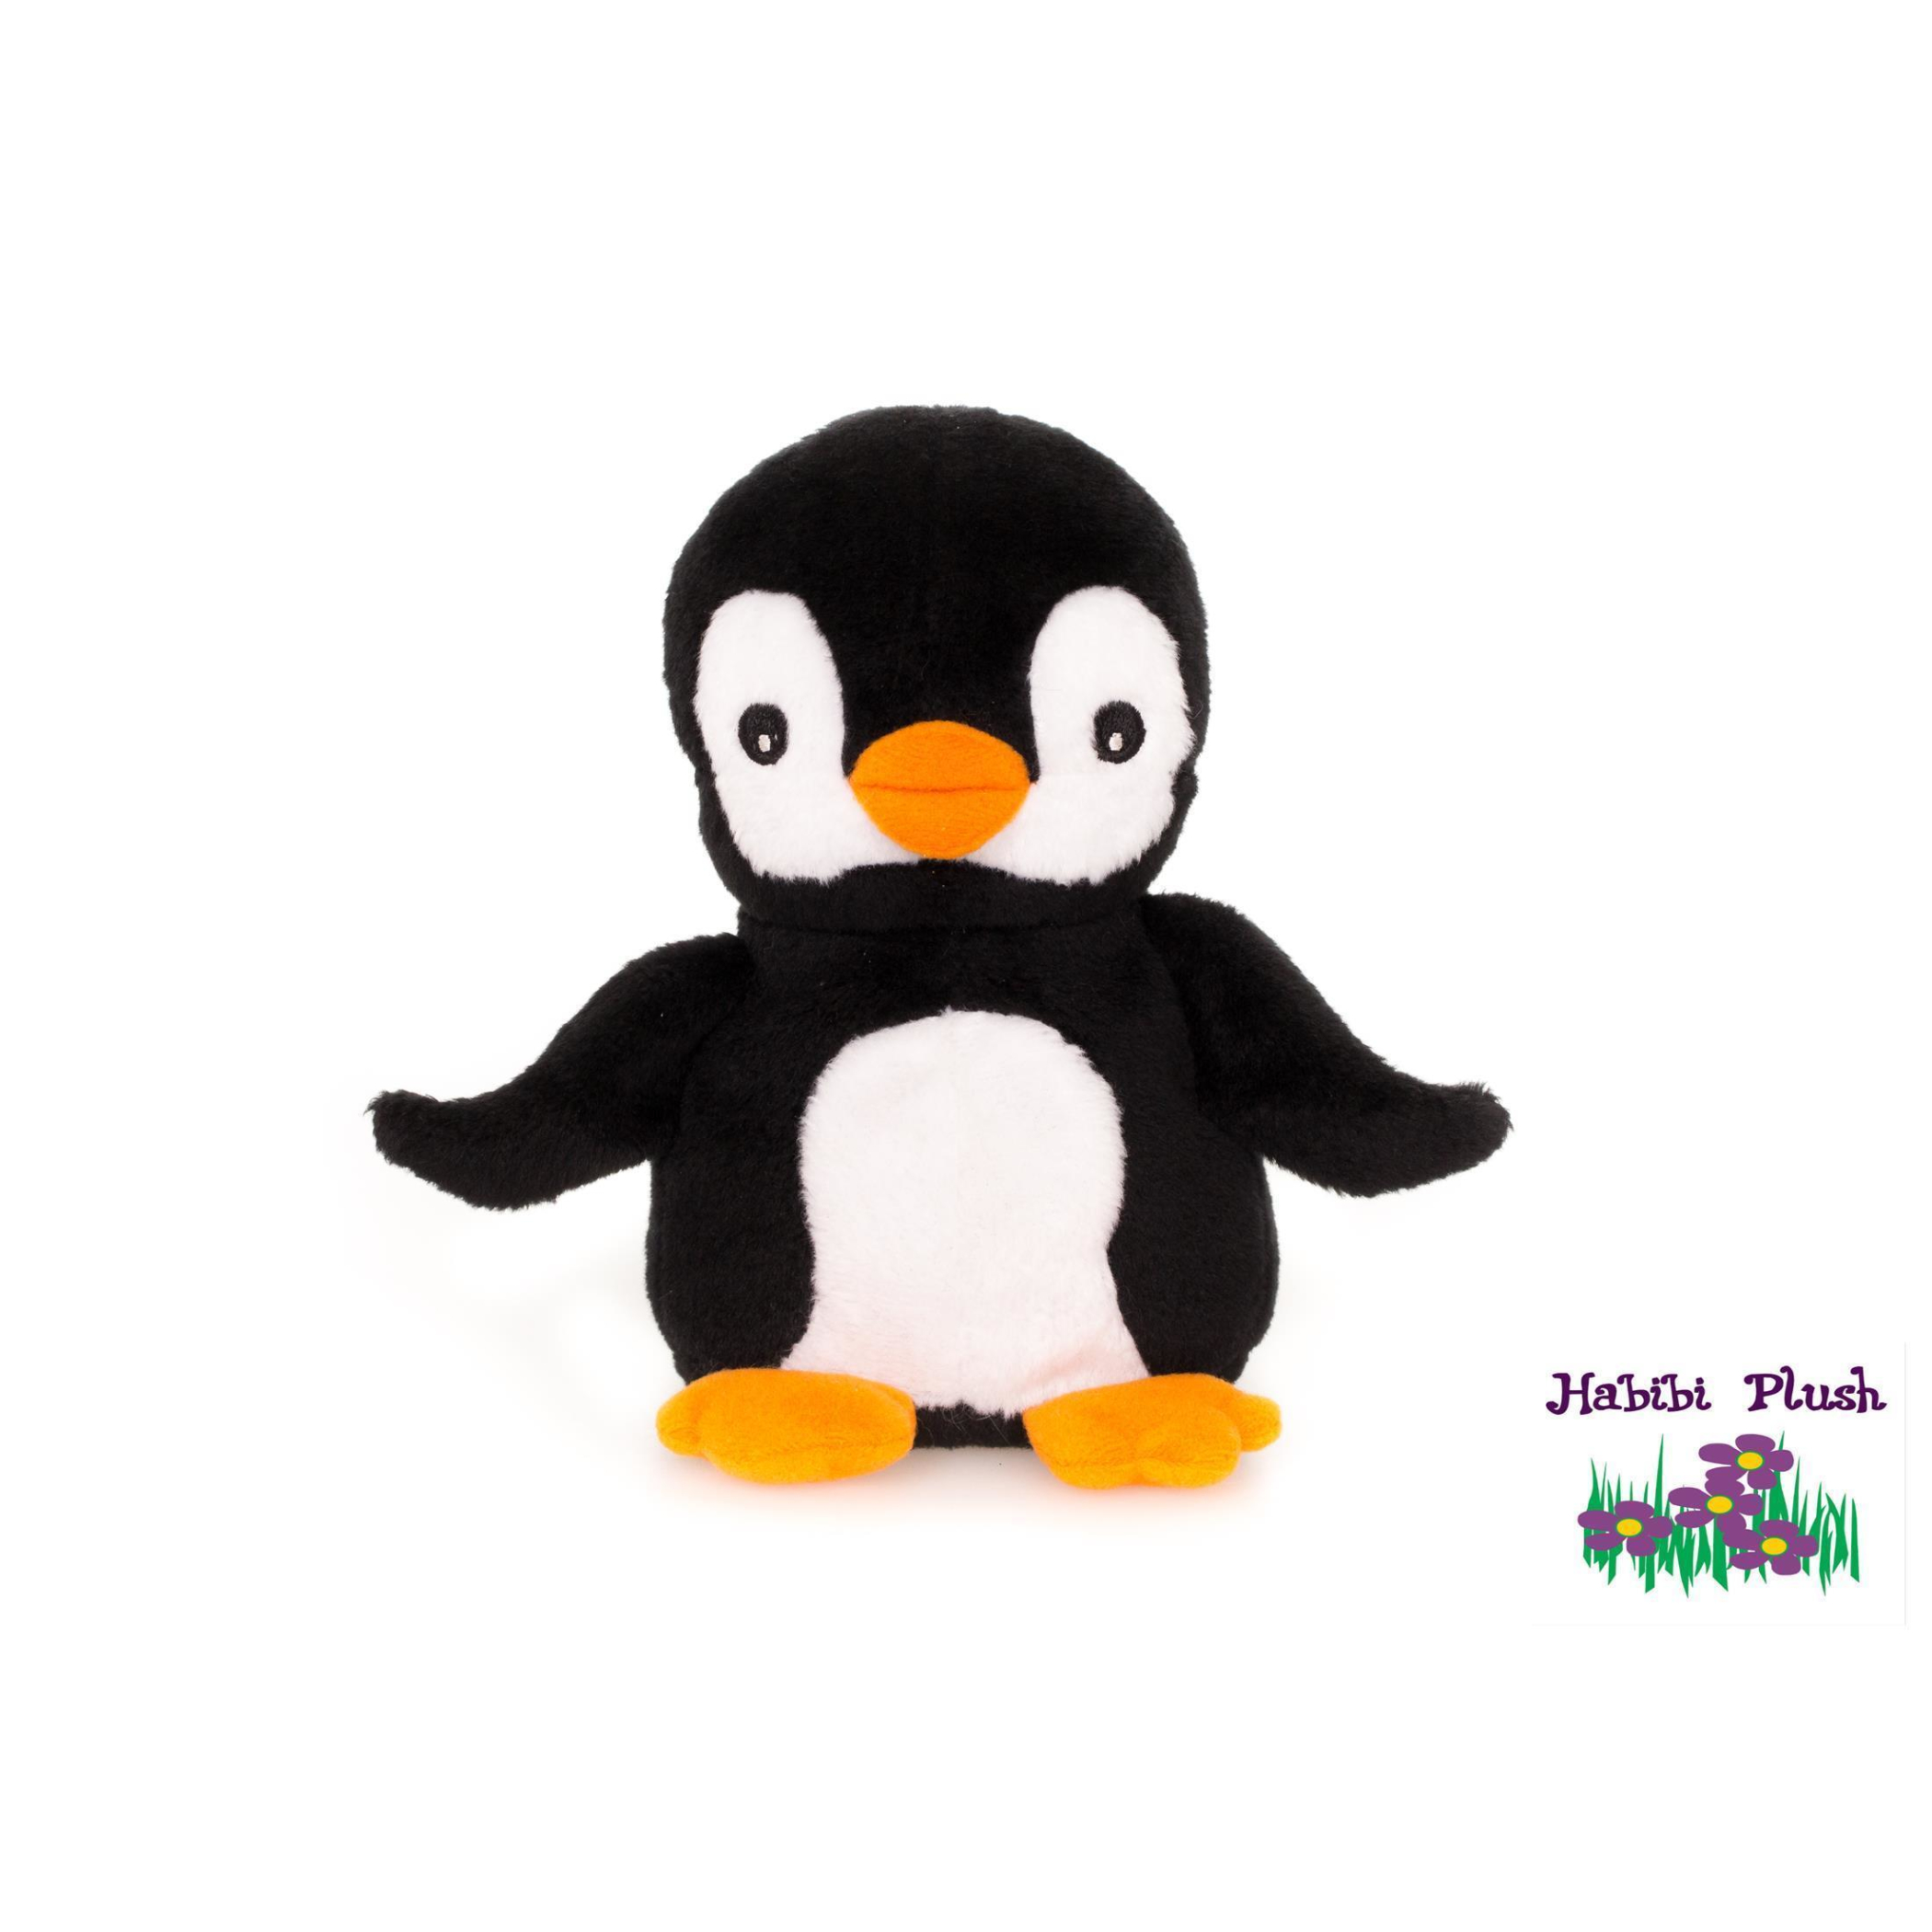 - Habibi Plush : Habibi Midi Pinguin mit herausnehmbarem Duftsäckchen -